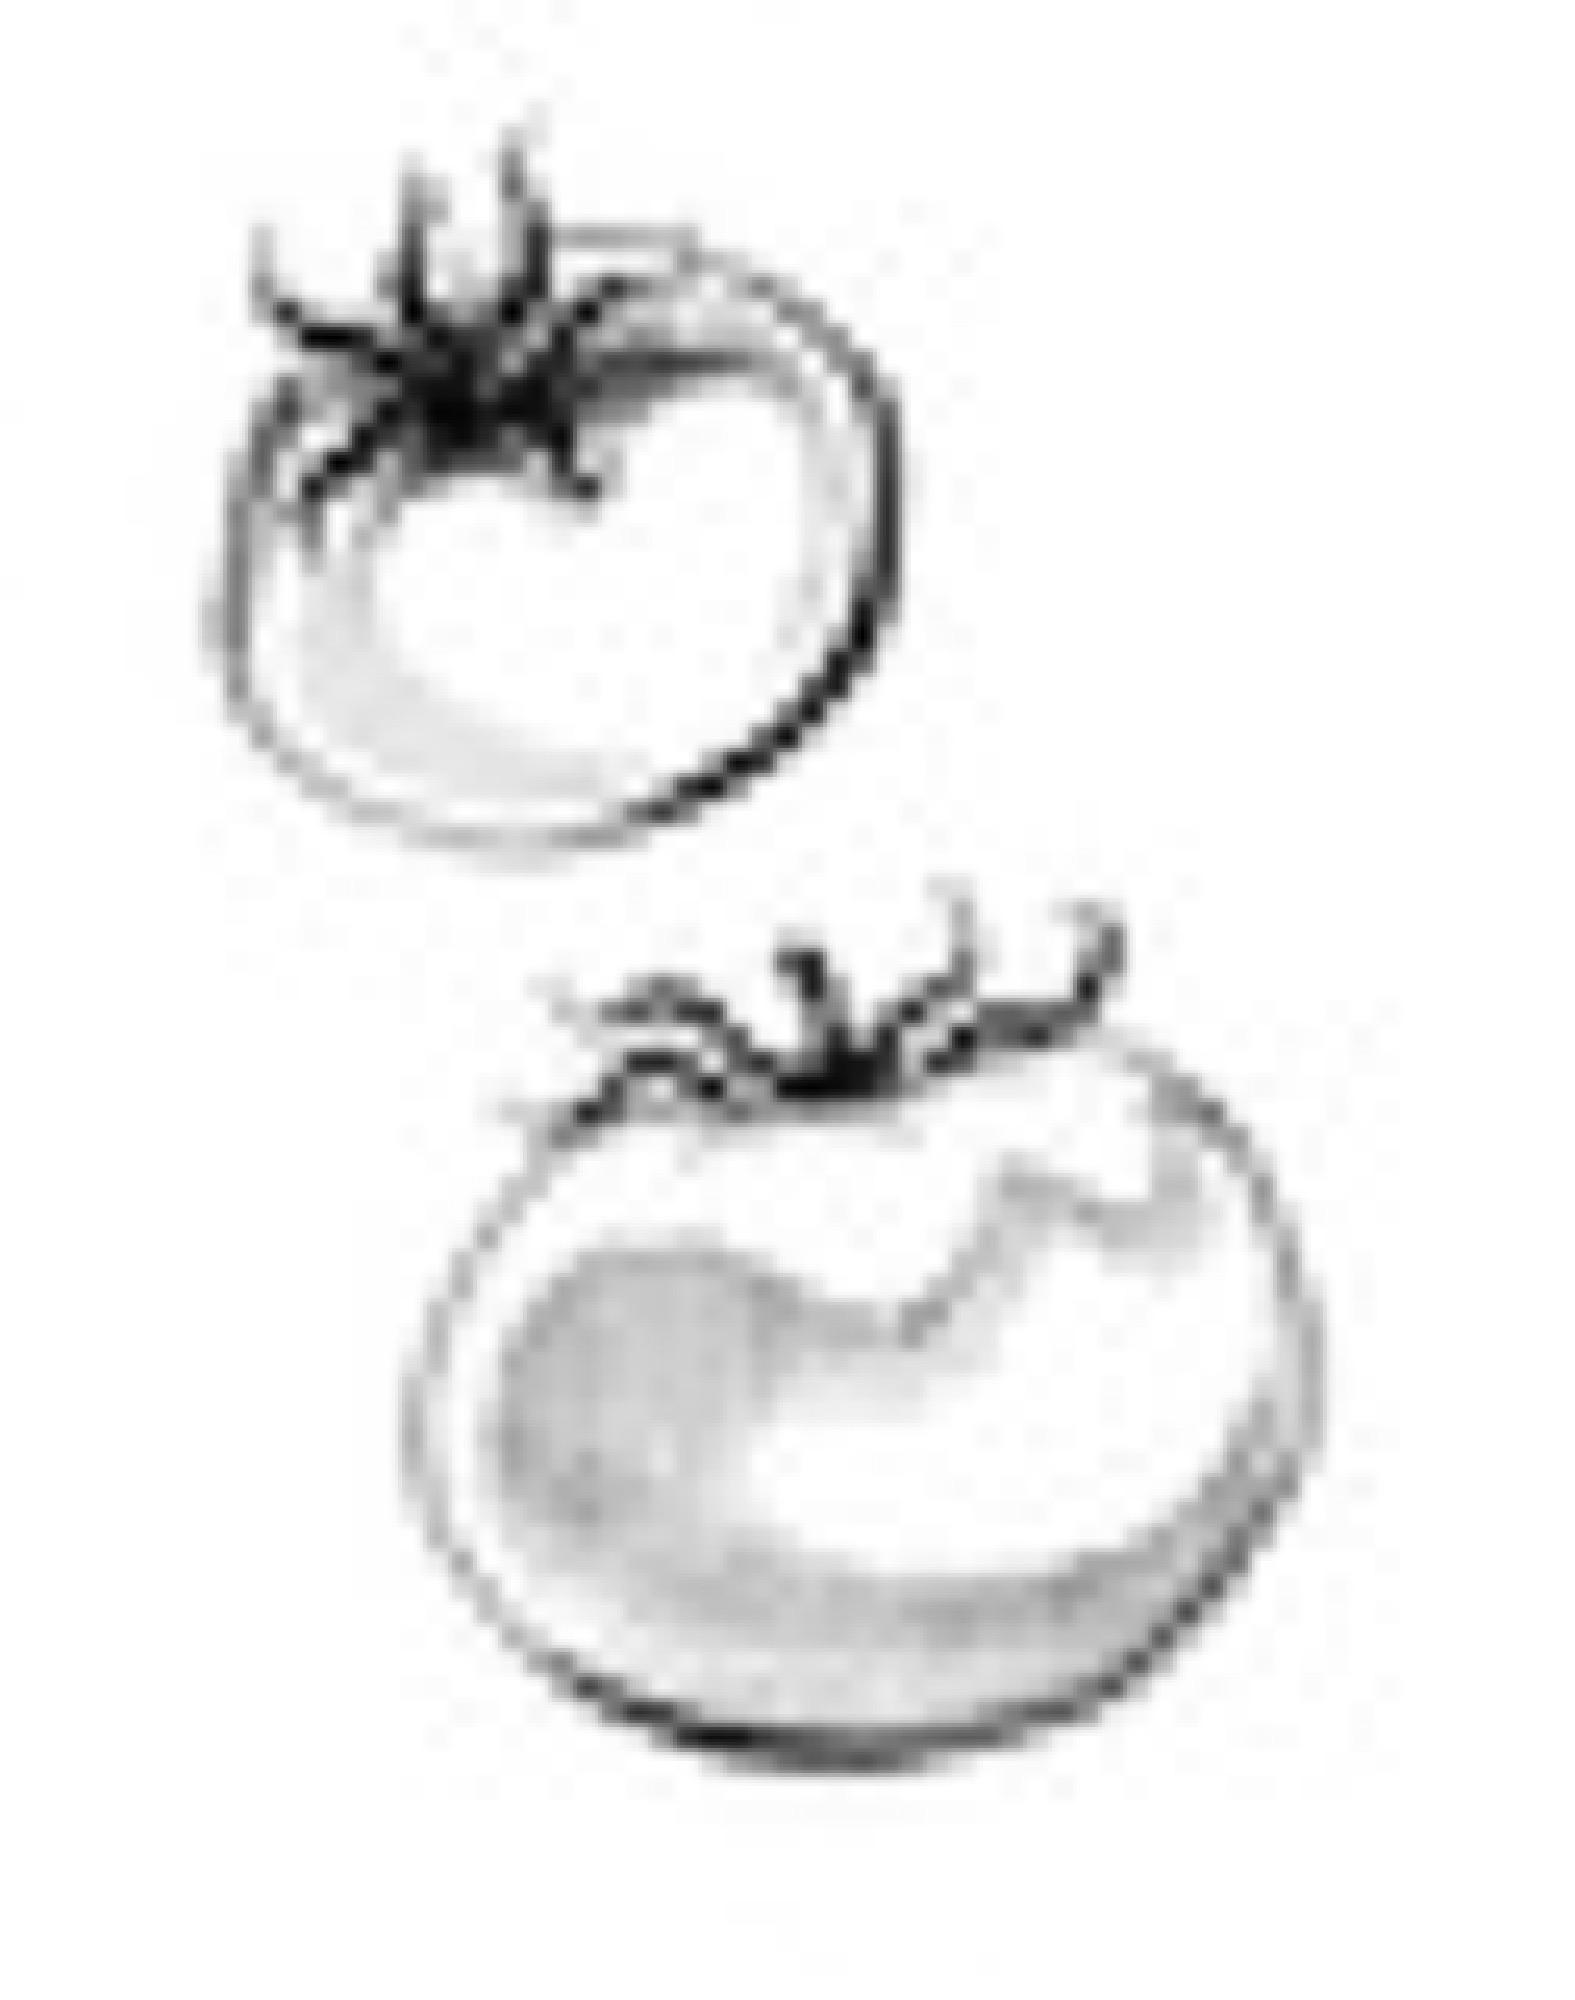 ica ratt enkelt tomater sagamariah